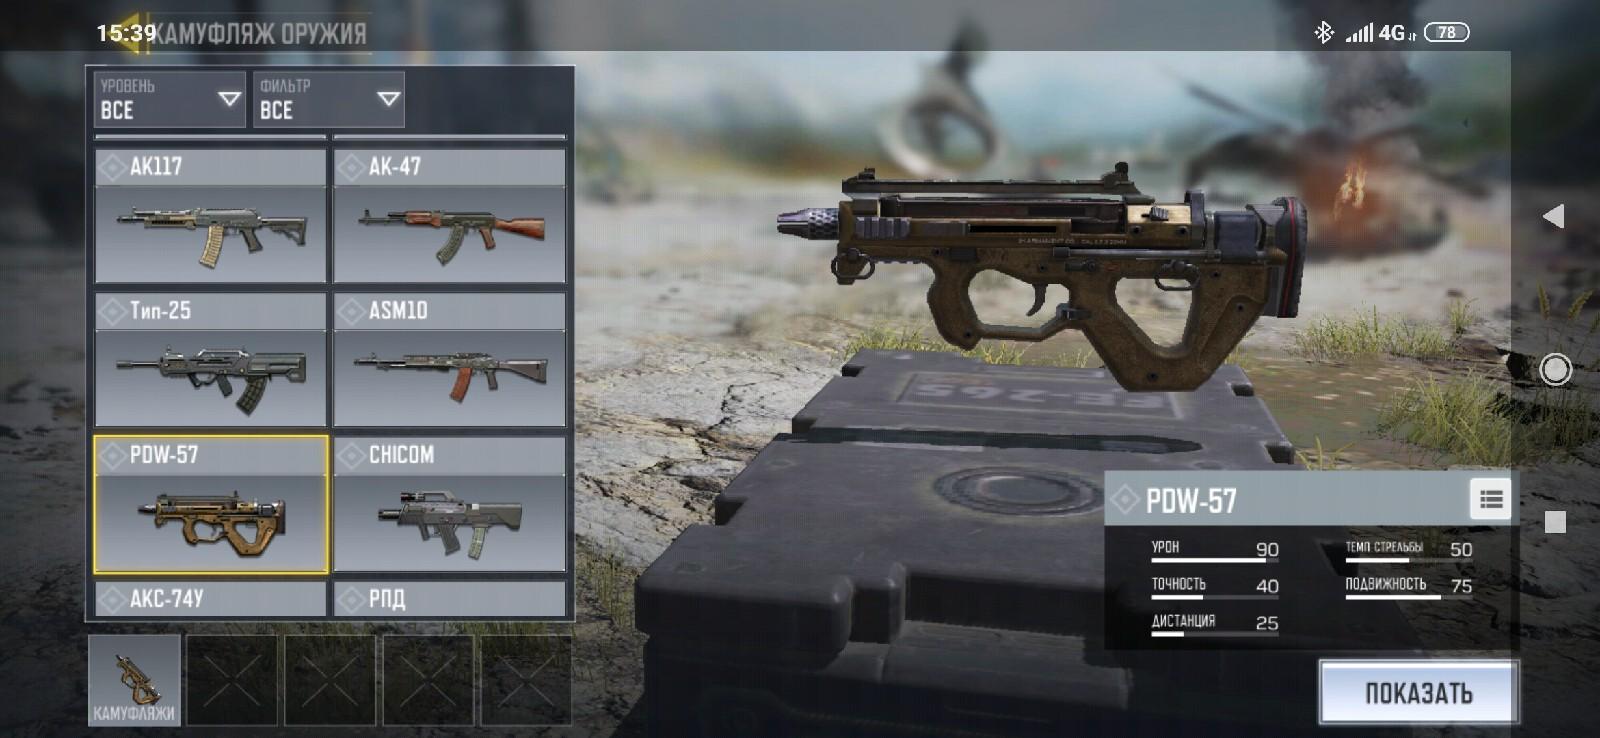 Luchshee Oruzhie V Call Of Duty Mobile Battle Royale Kanobu